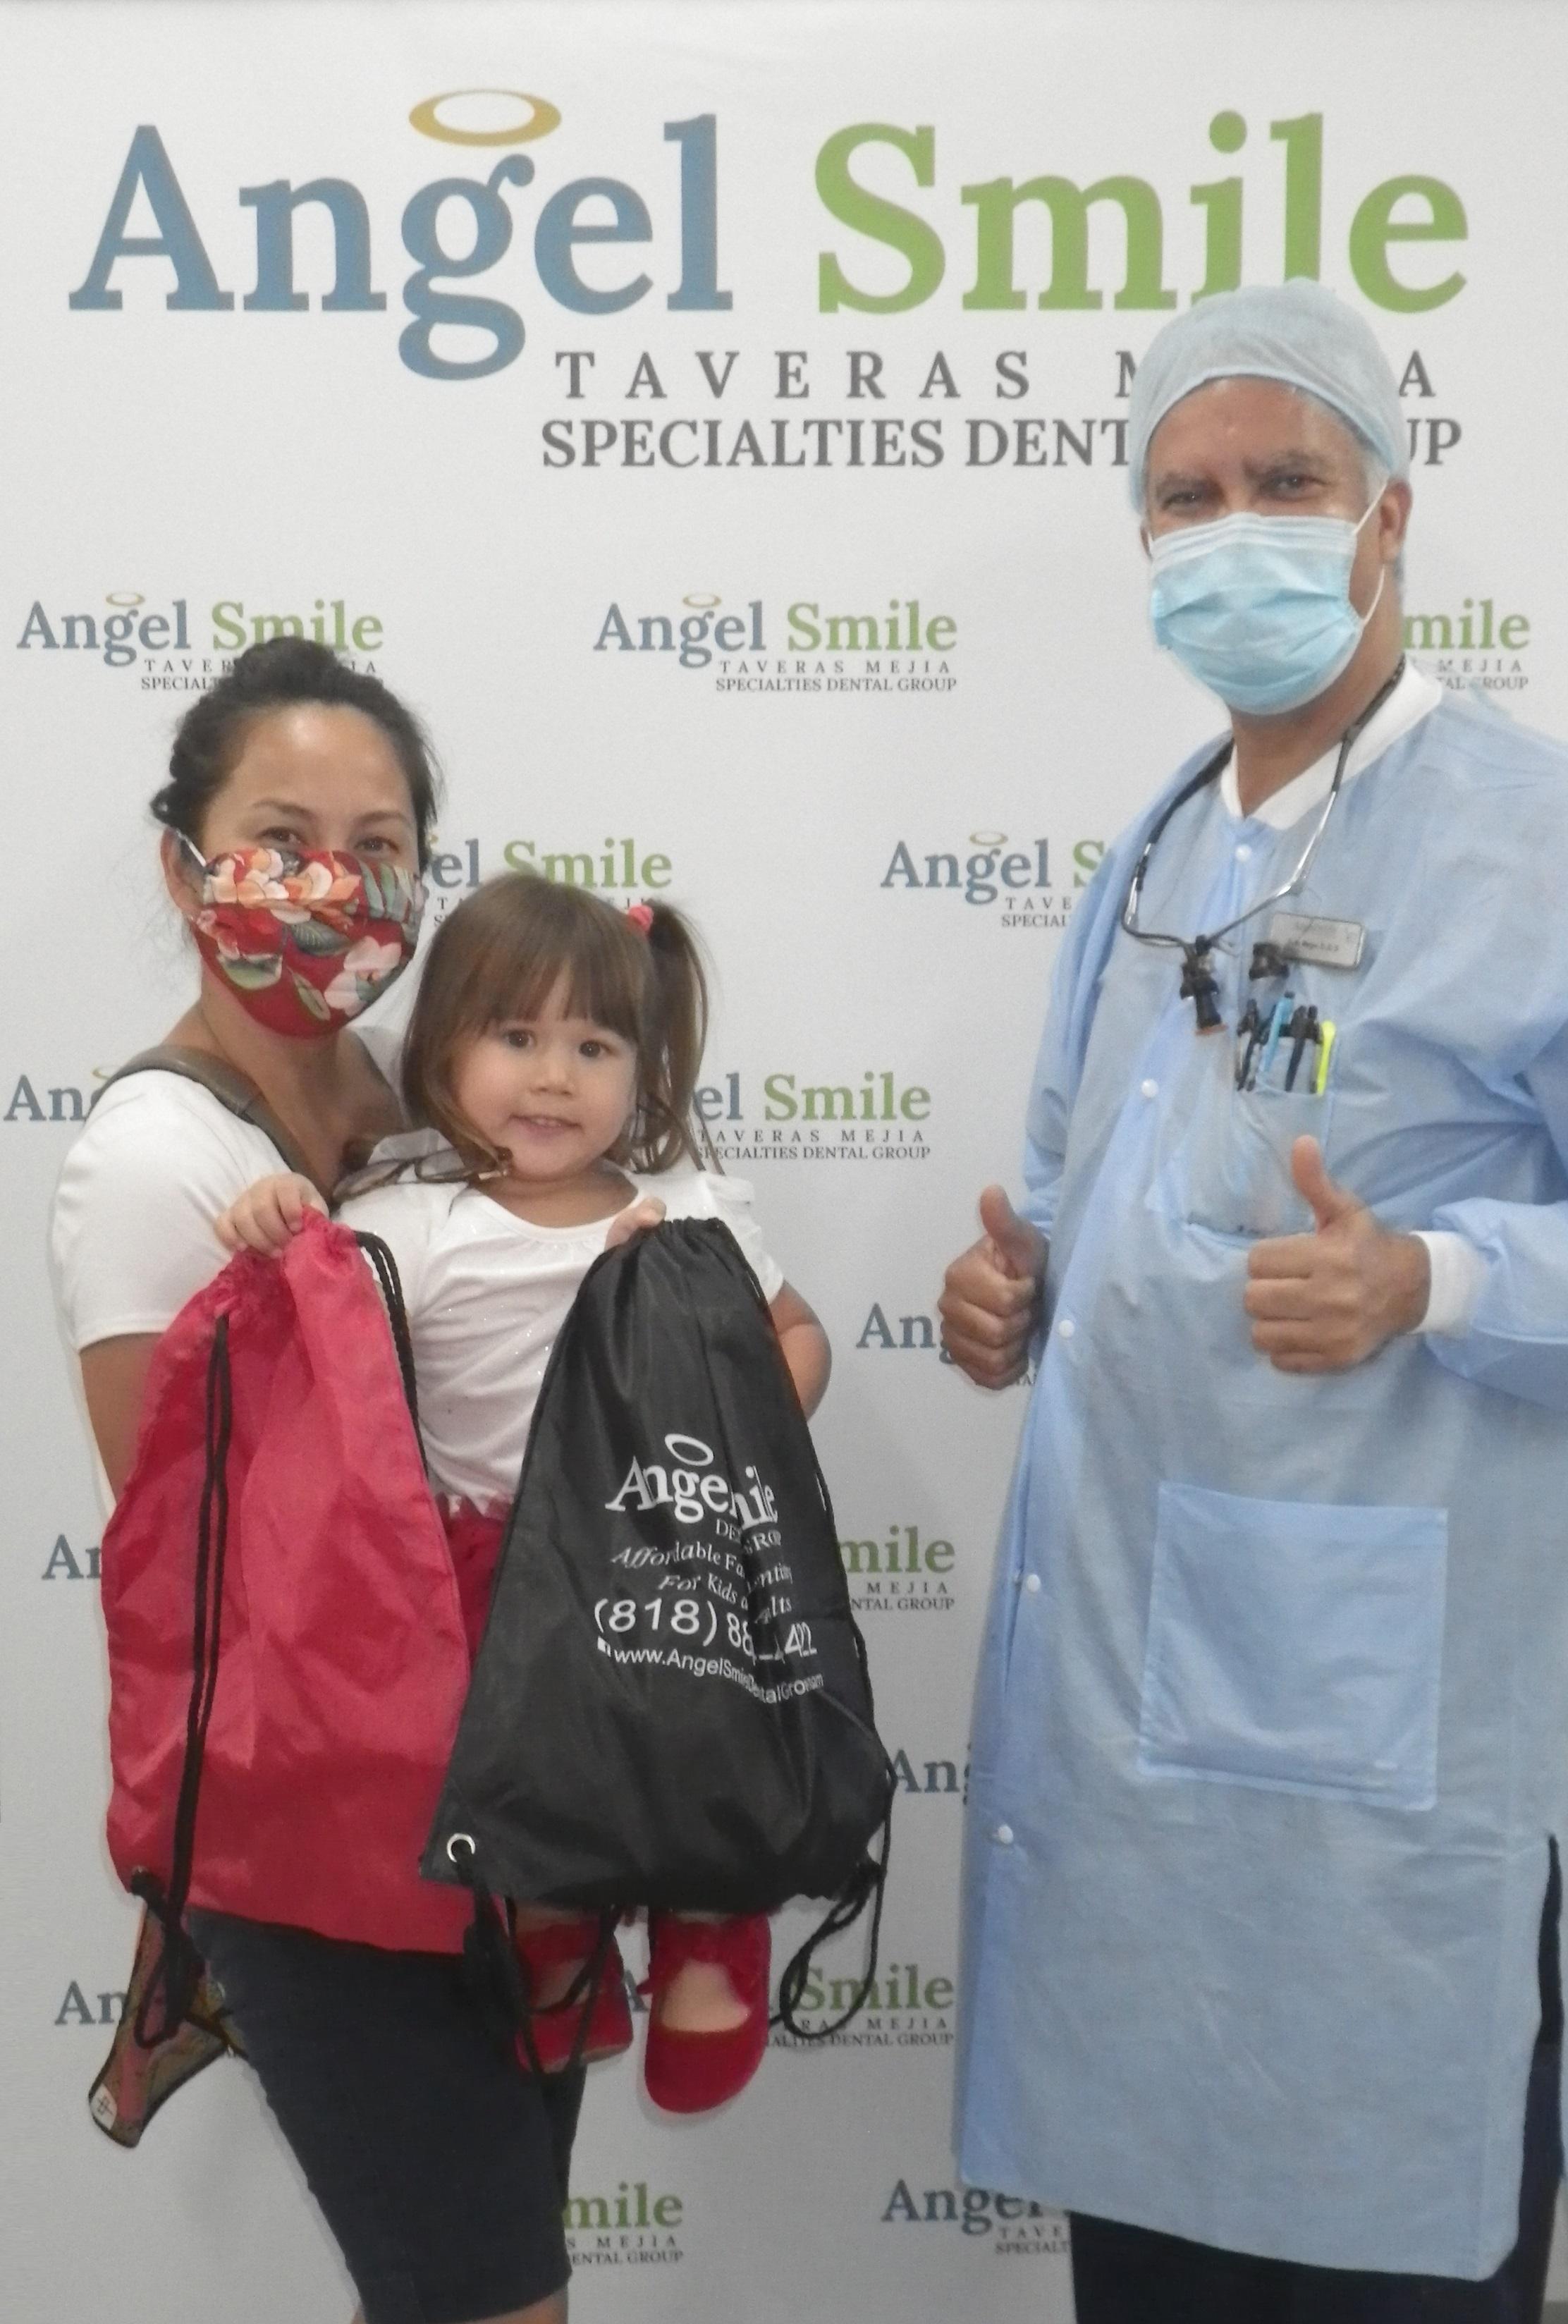 Family Dentist in Canoga Park & Chatsworth